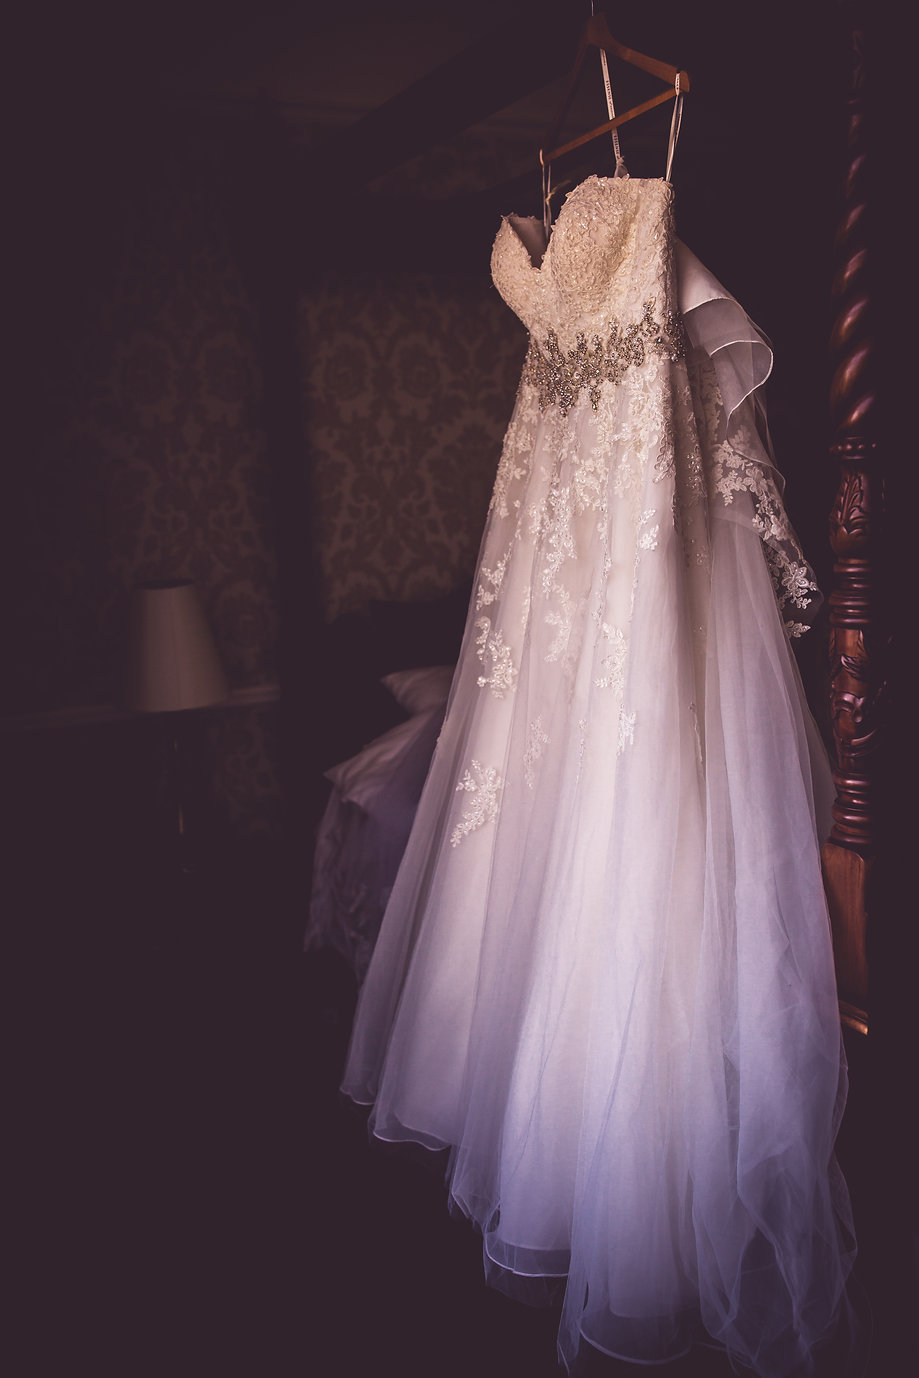 dress at millenium wedding